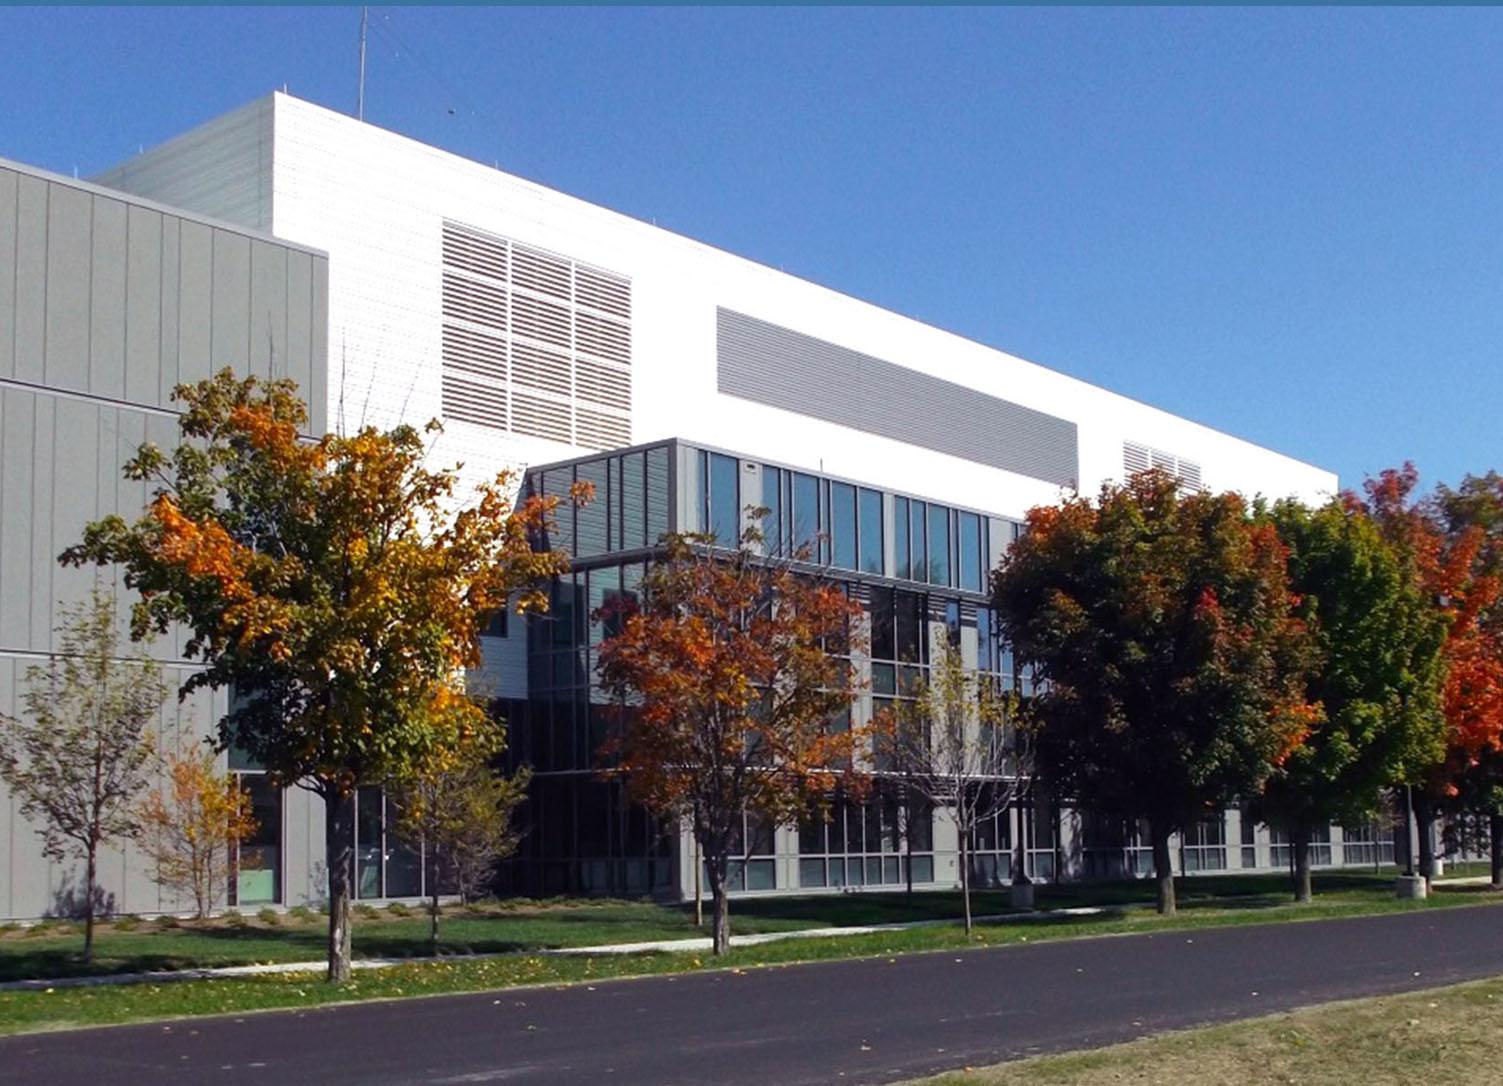 Vermont Health Department Laboratory building